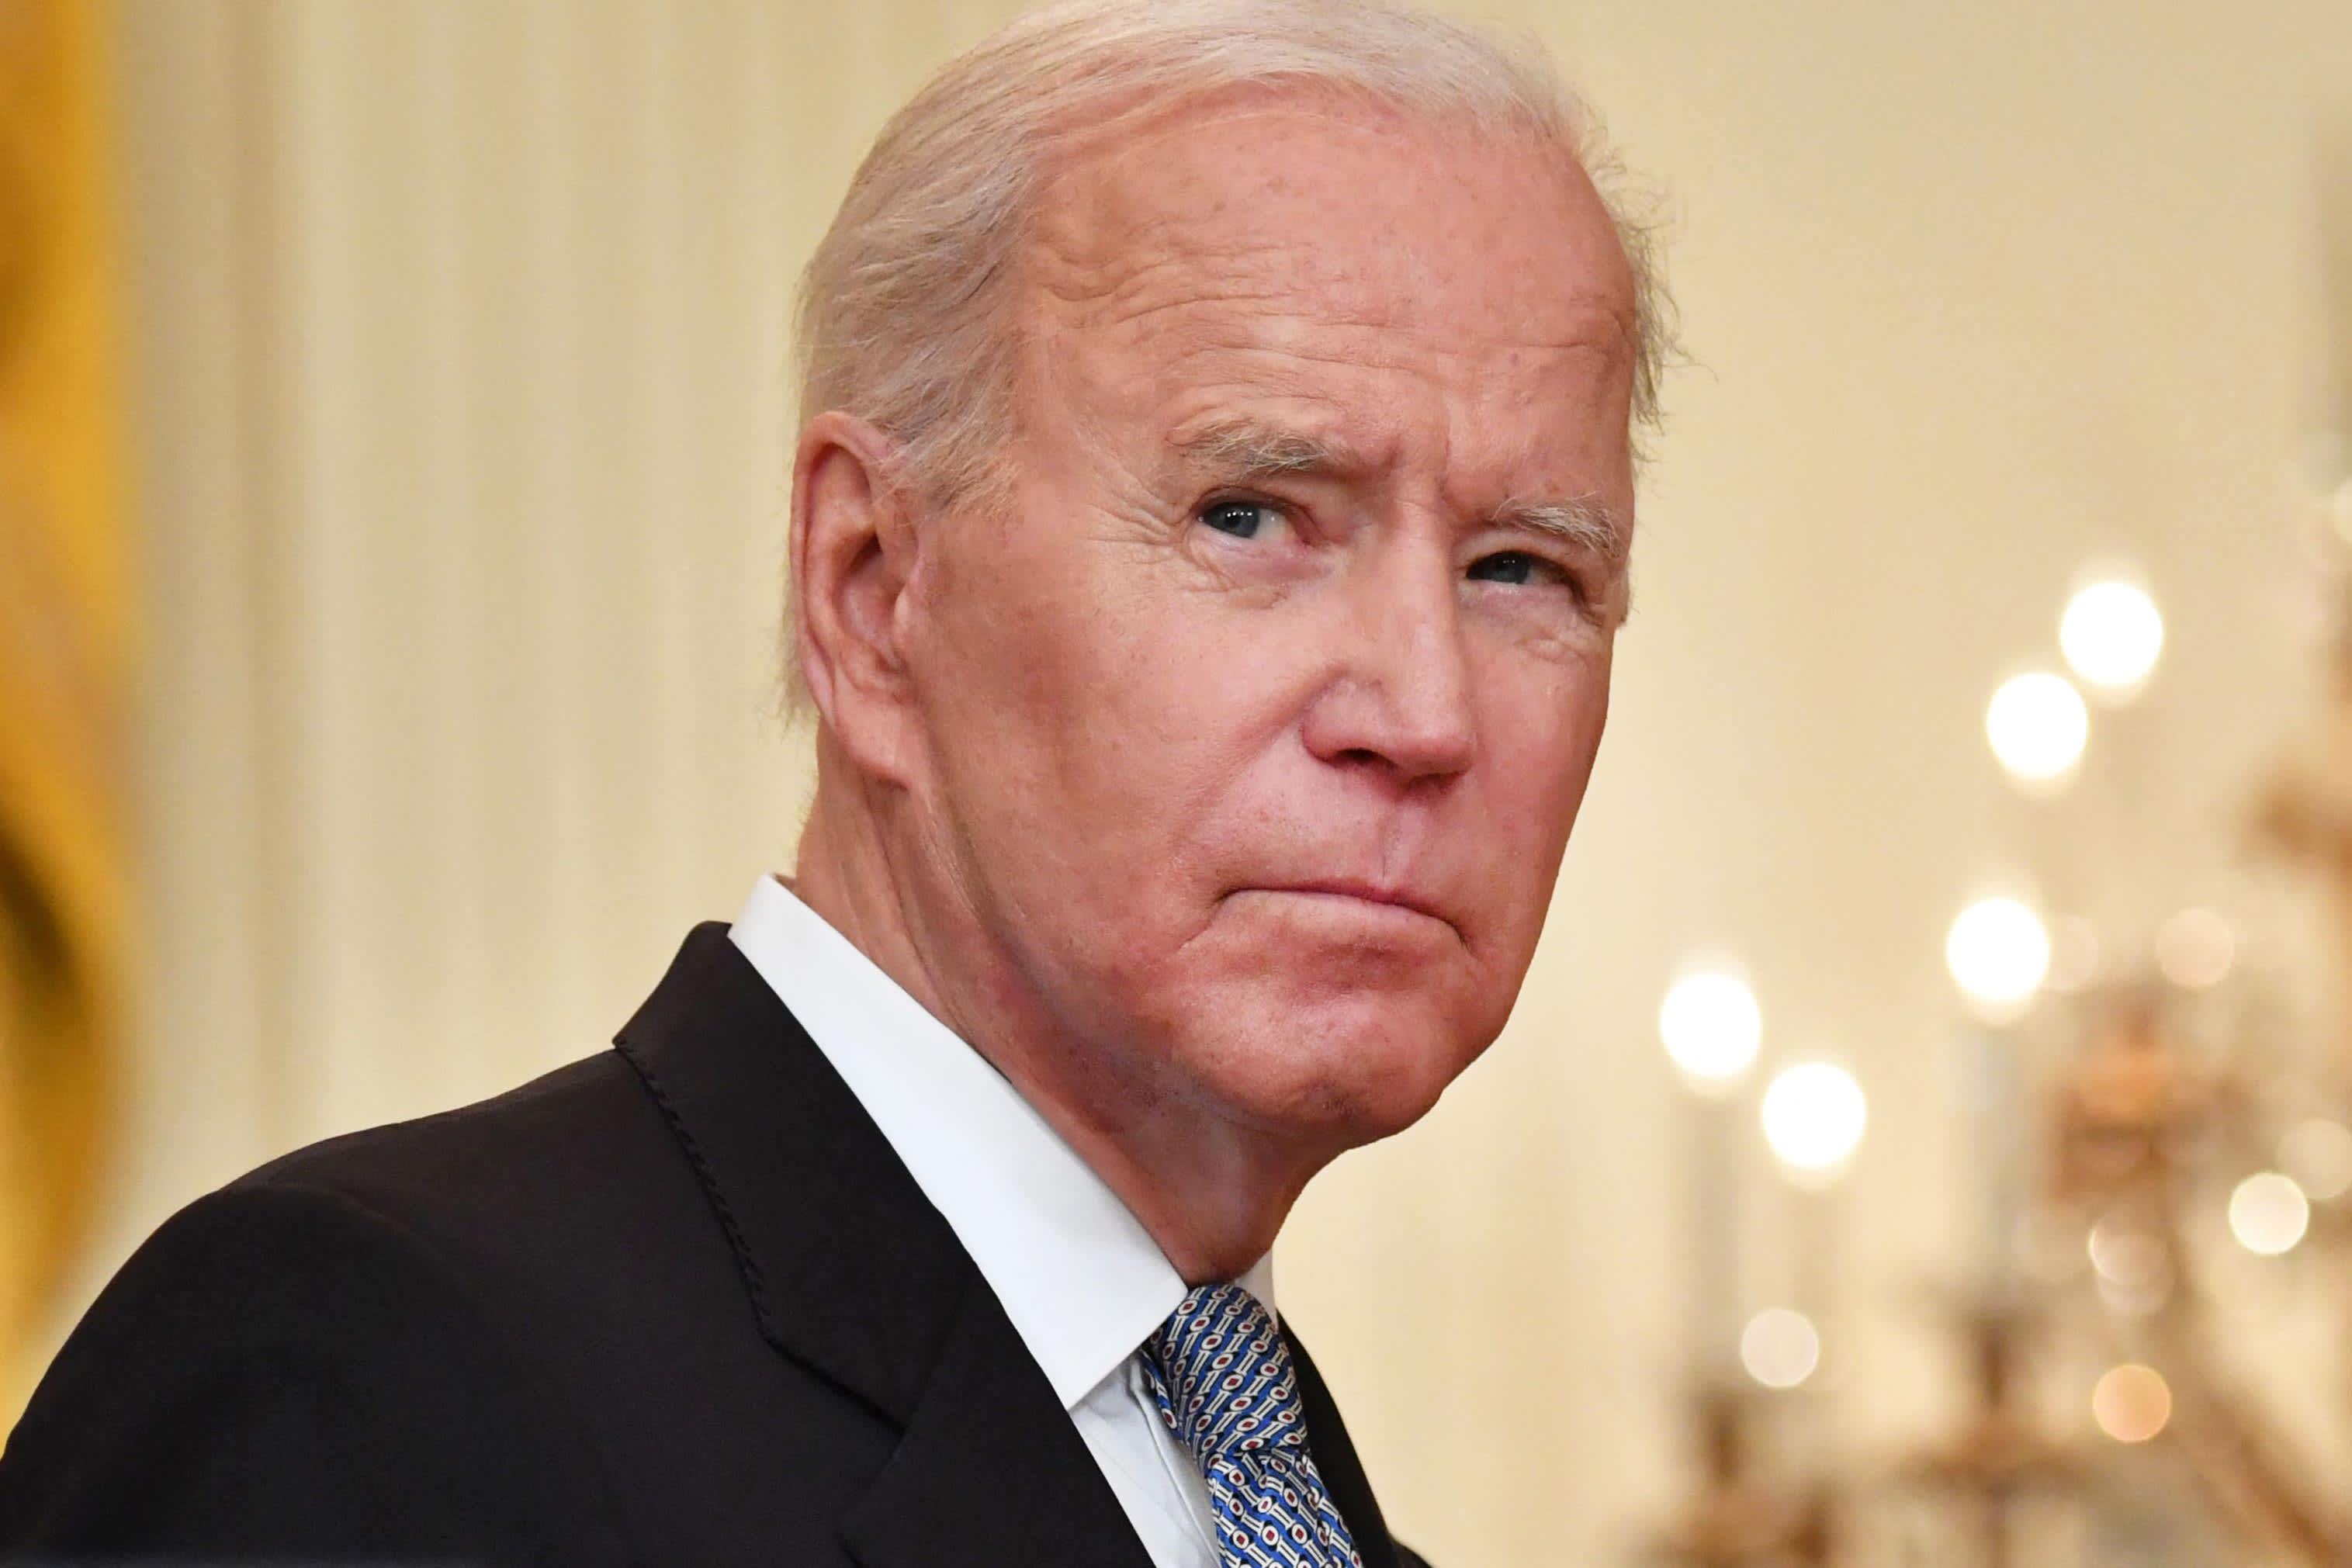 Biden informs Netanyahu U.S. supports ceasefire as Israel, Hamas dispute intensifies thumbnail